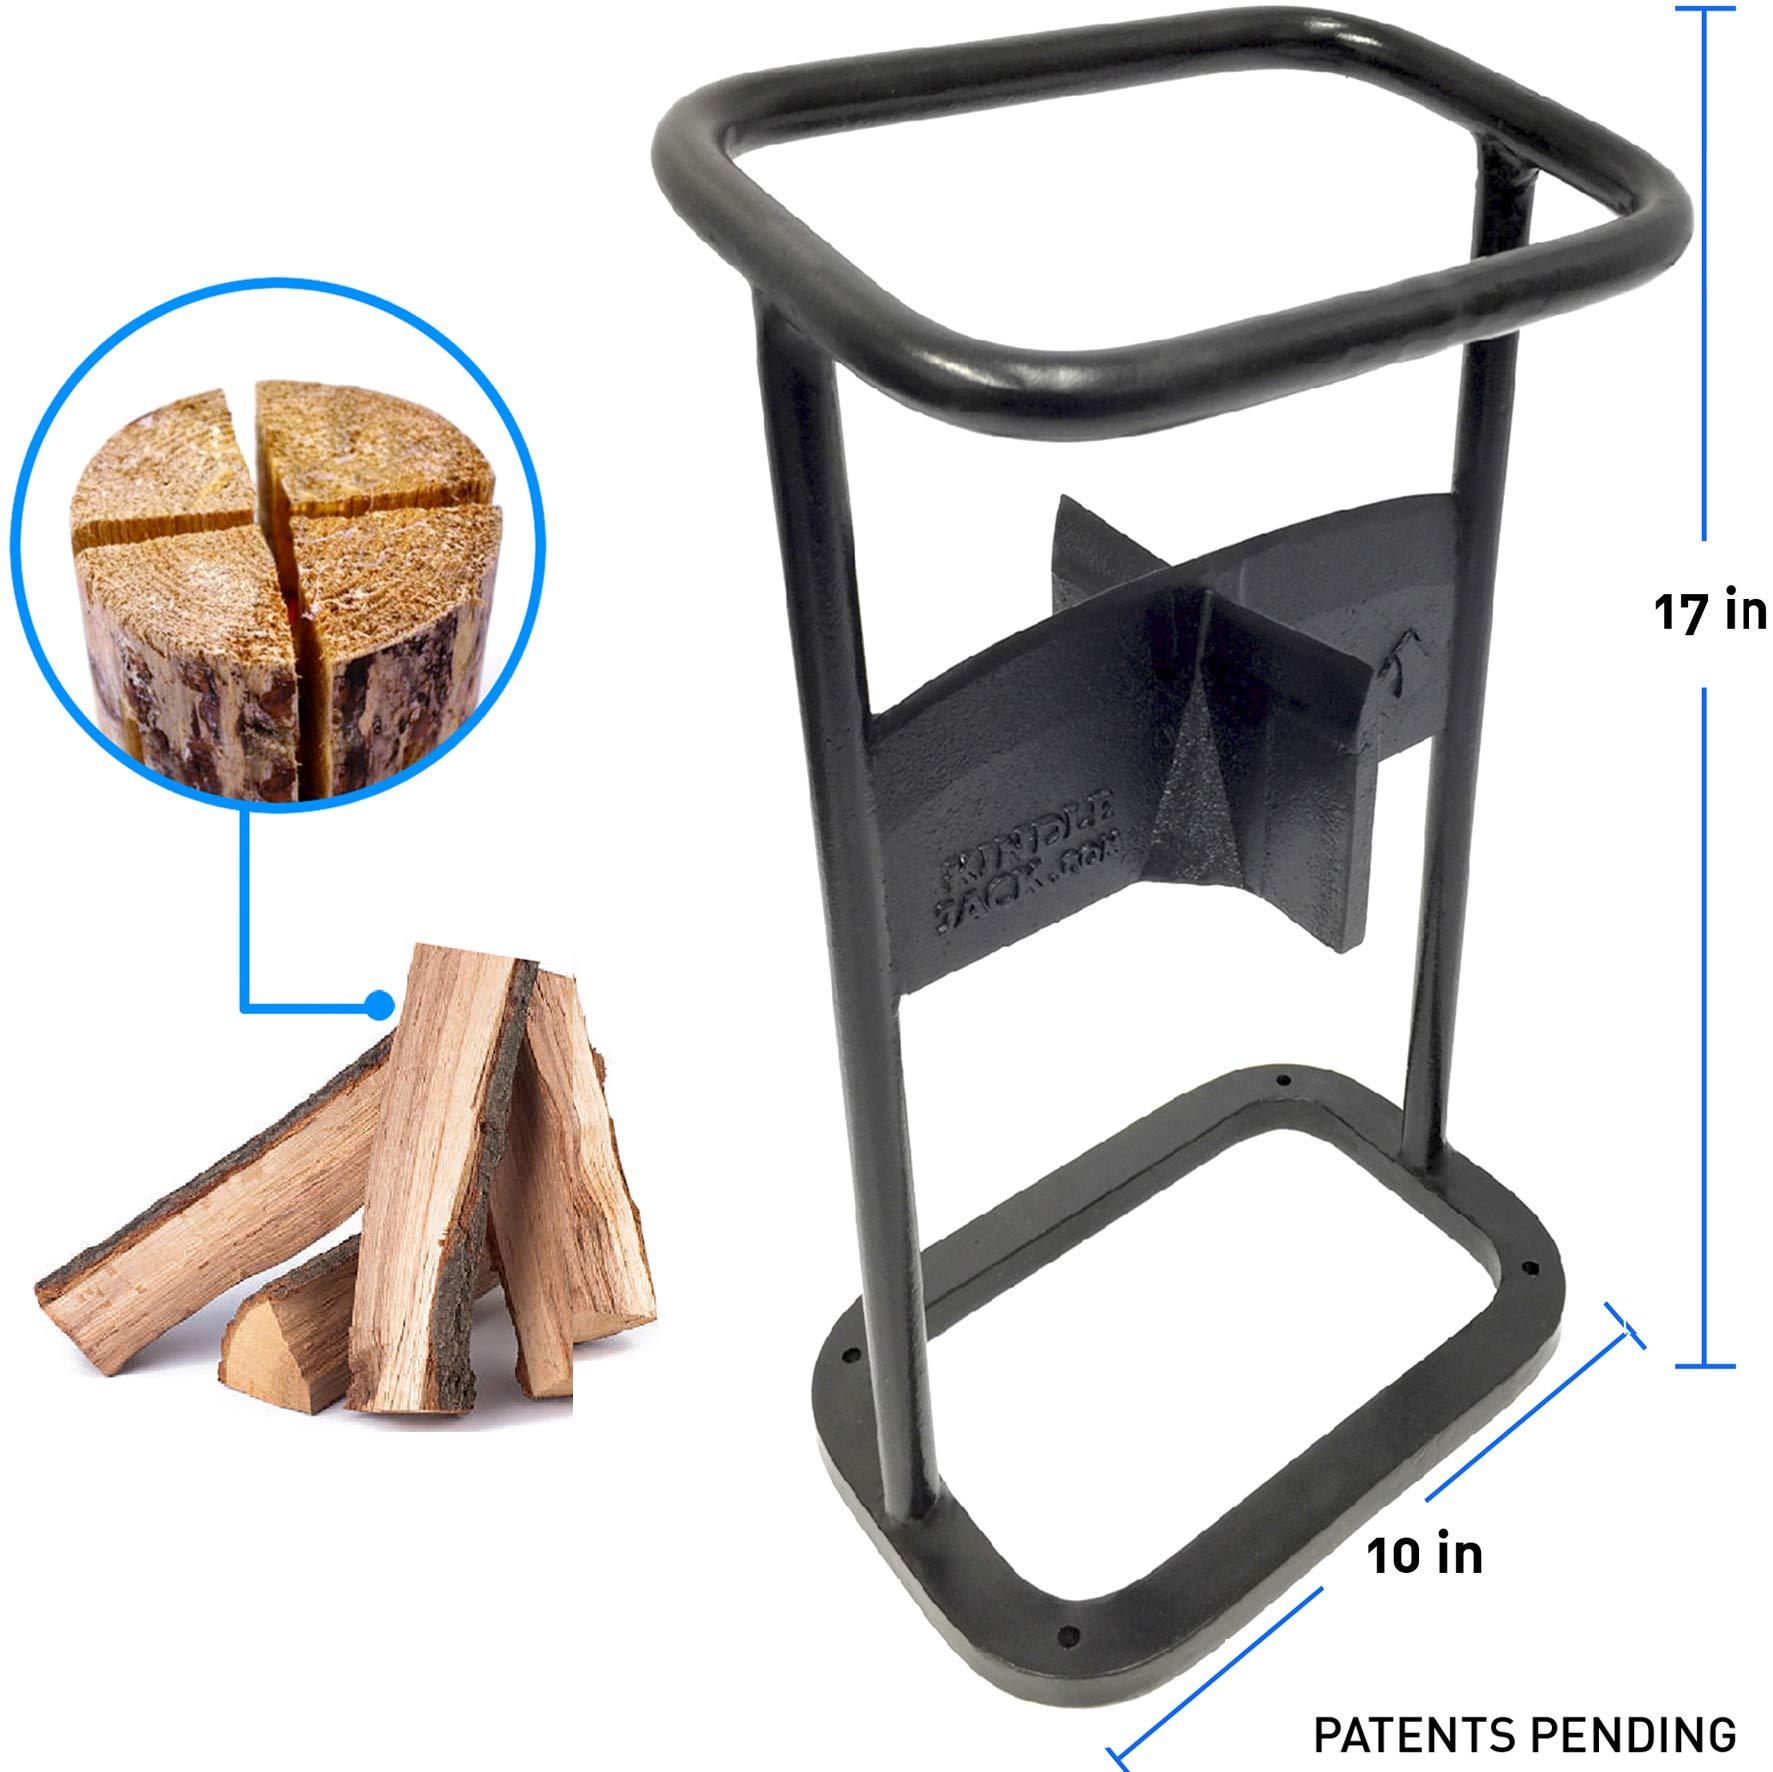 EasyGoProducts EGP FRE 019 1 Jack Firewood Kindling